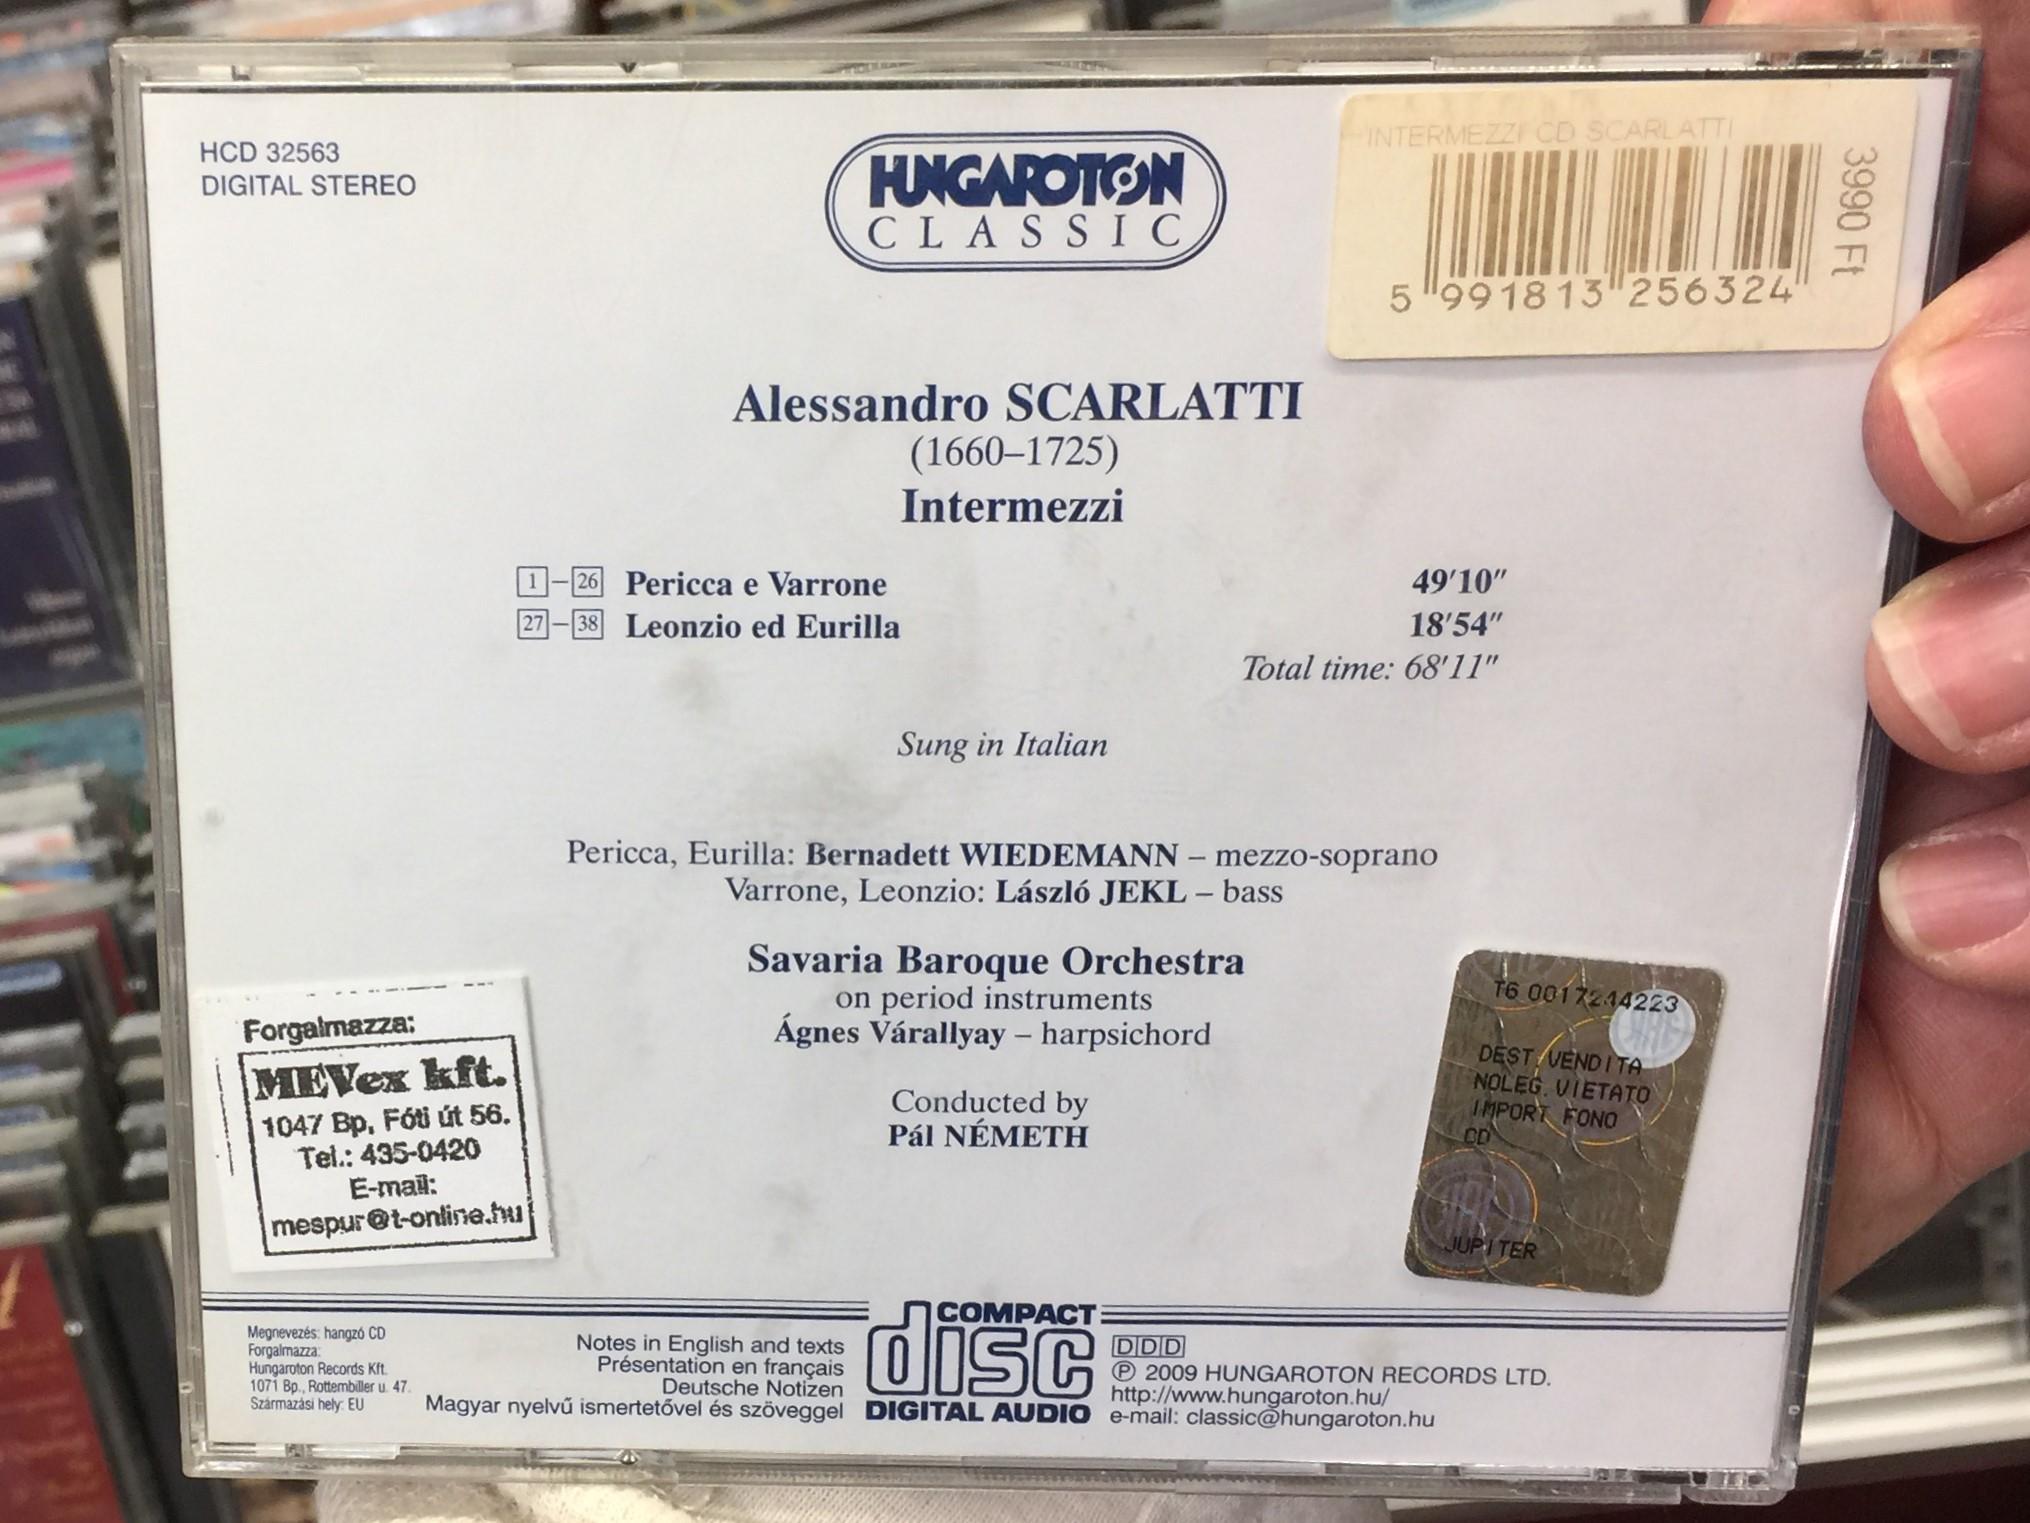 alessandro-scarlatti-intermezzi-pericca-e-varrone-leonzio-ed-eurilla-bernadett-wiedemann-laszlo-jekl-savaria-baroque-orchestra-on-period-instruments-pal-nemeth-hungaroton-classic-audio-cd.jpg